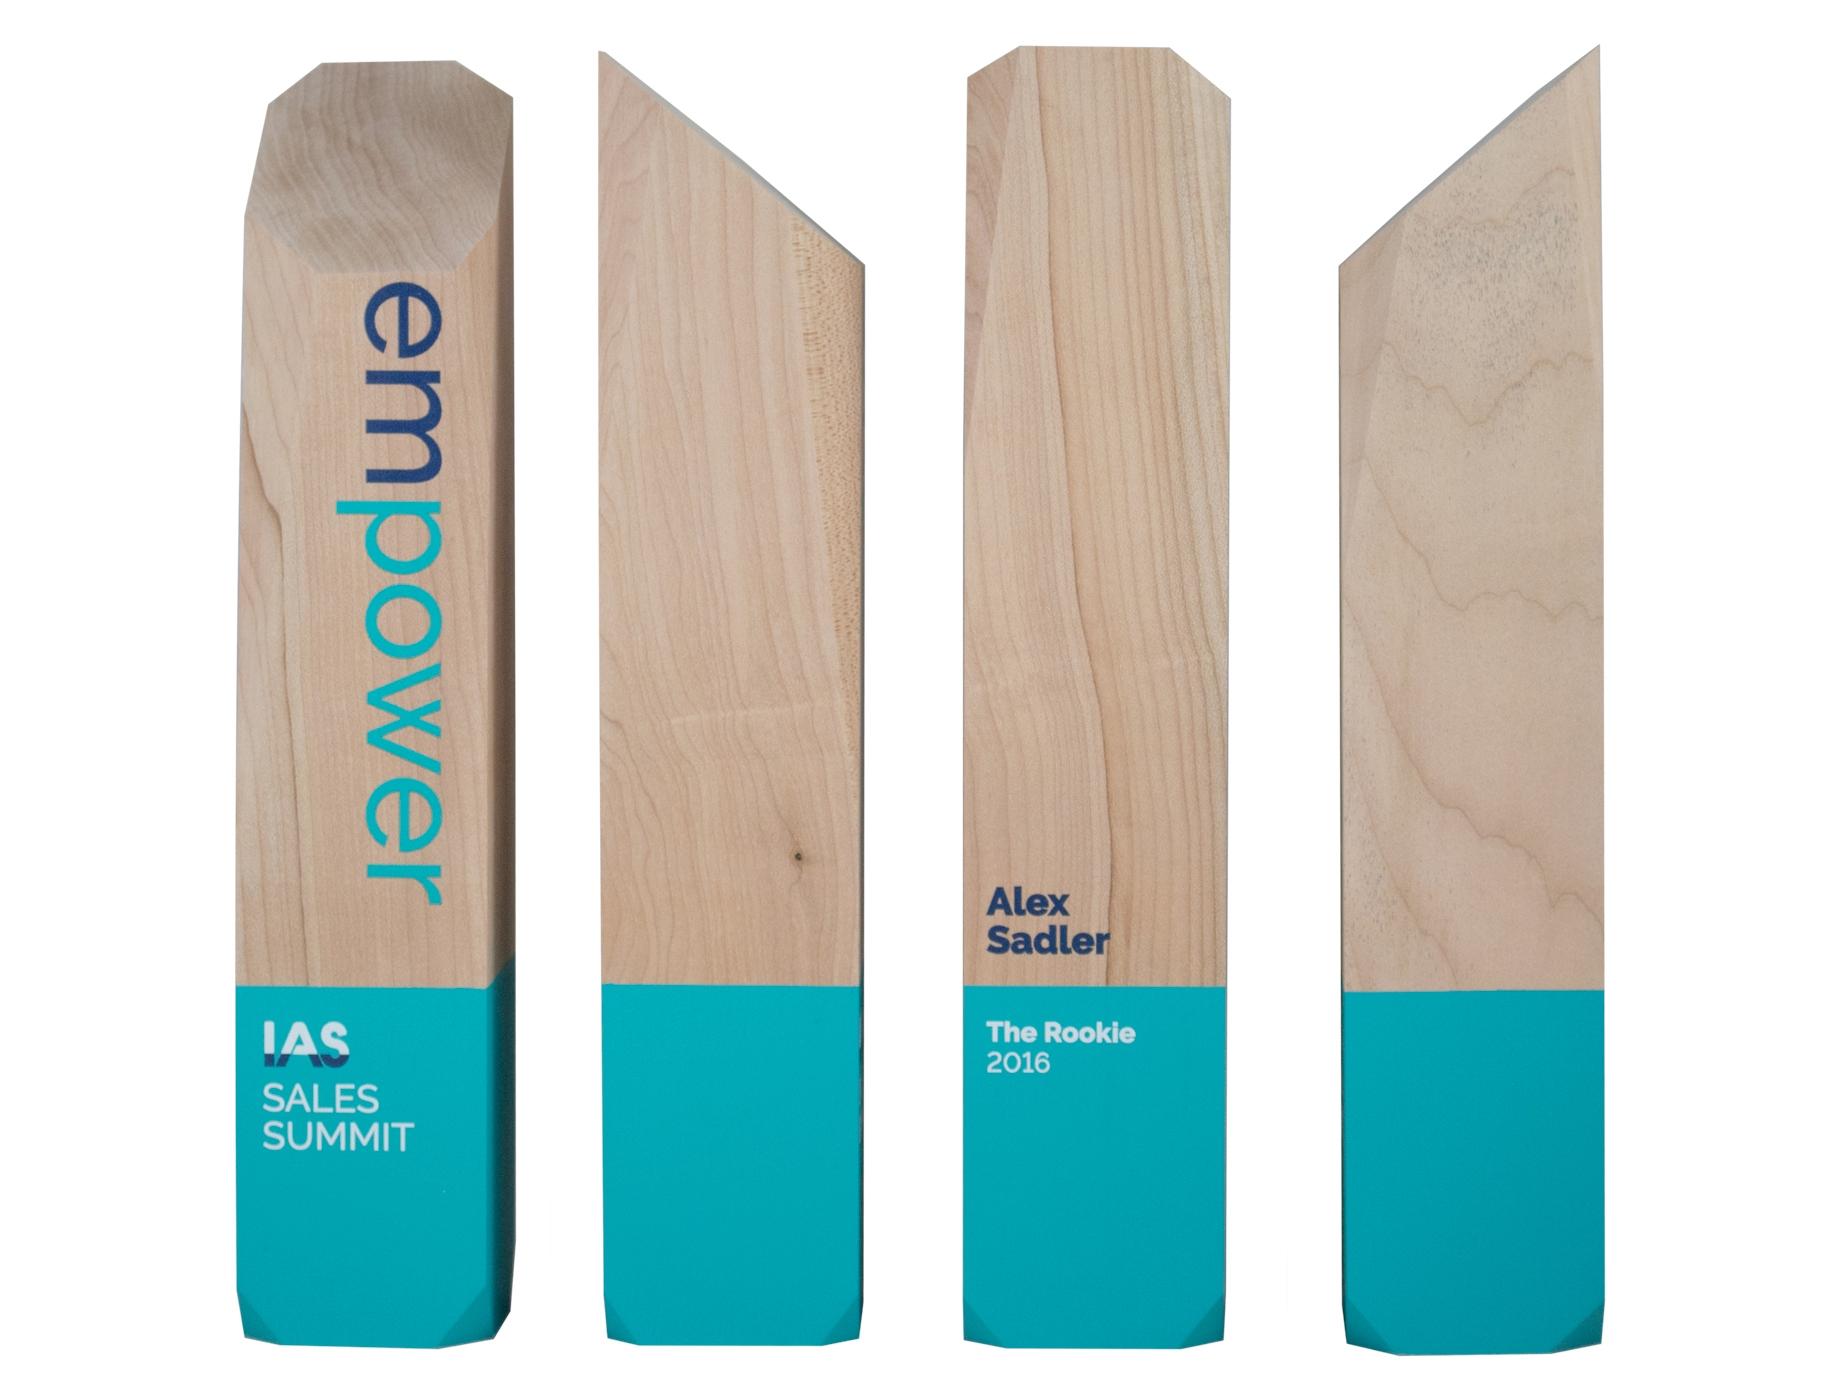 IAS-custom-eco-friendly-award-trophy.jpg